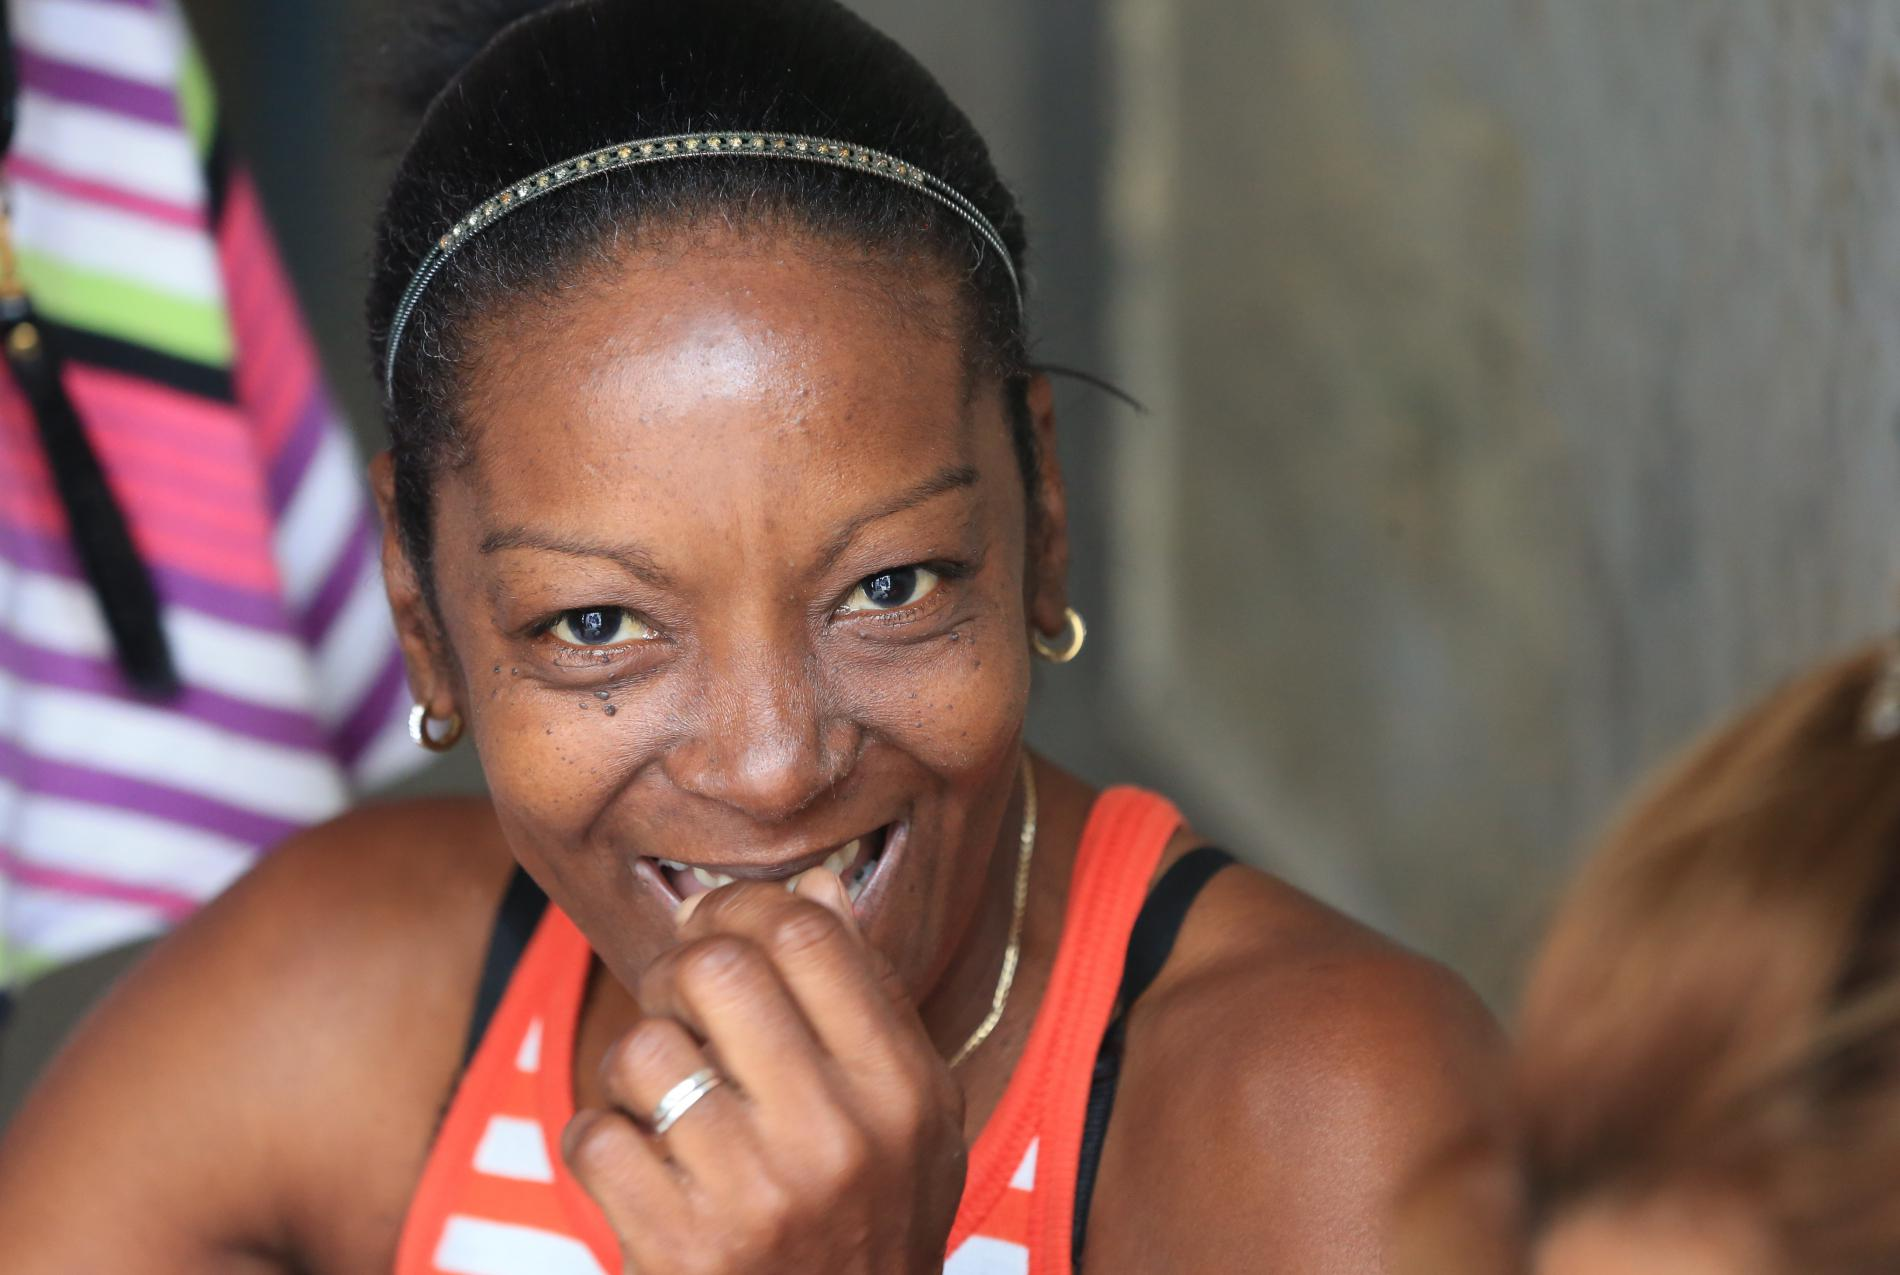 Cuba : Nos voyages solidaires